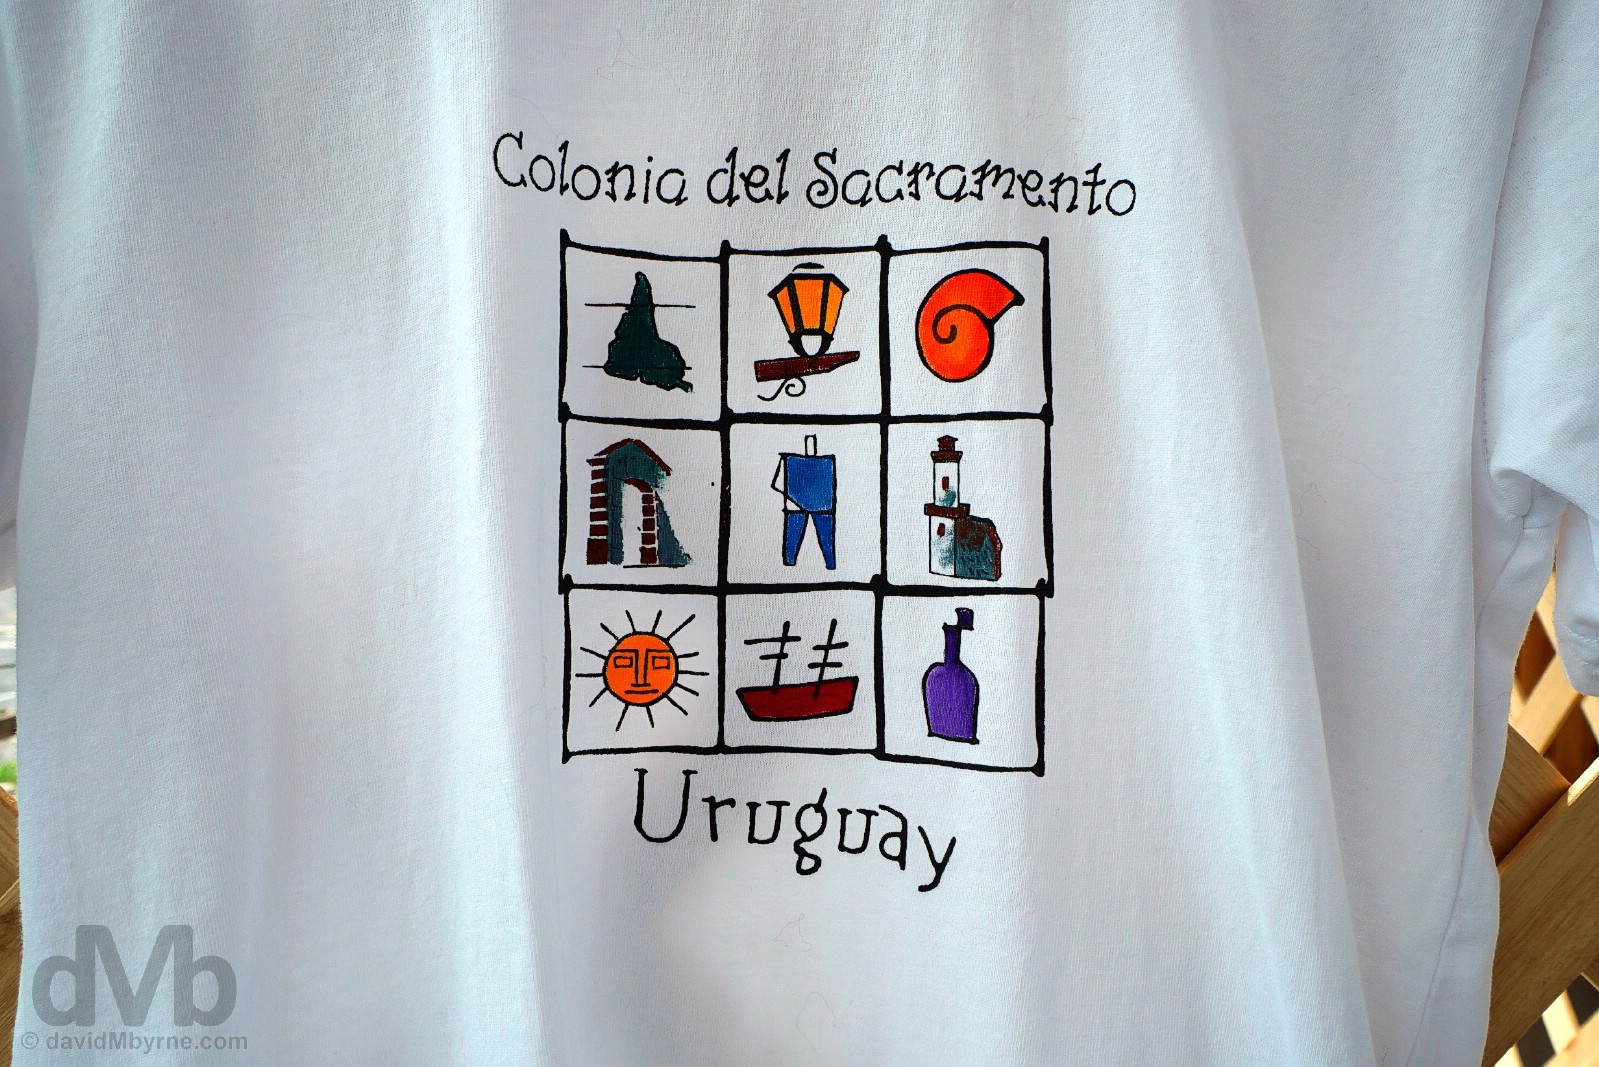 Colonia del Sacramento, Uruguay. September 20, 2015.